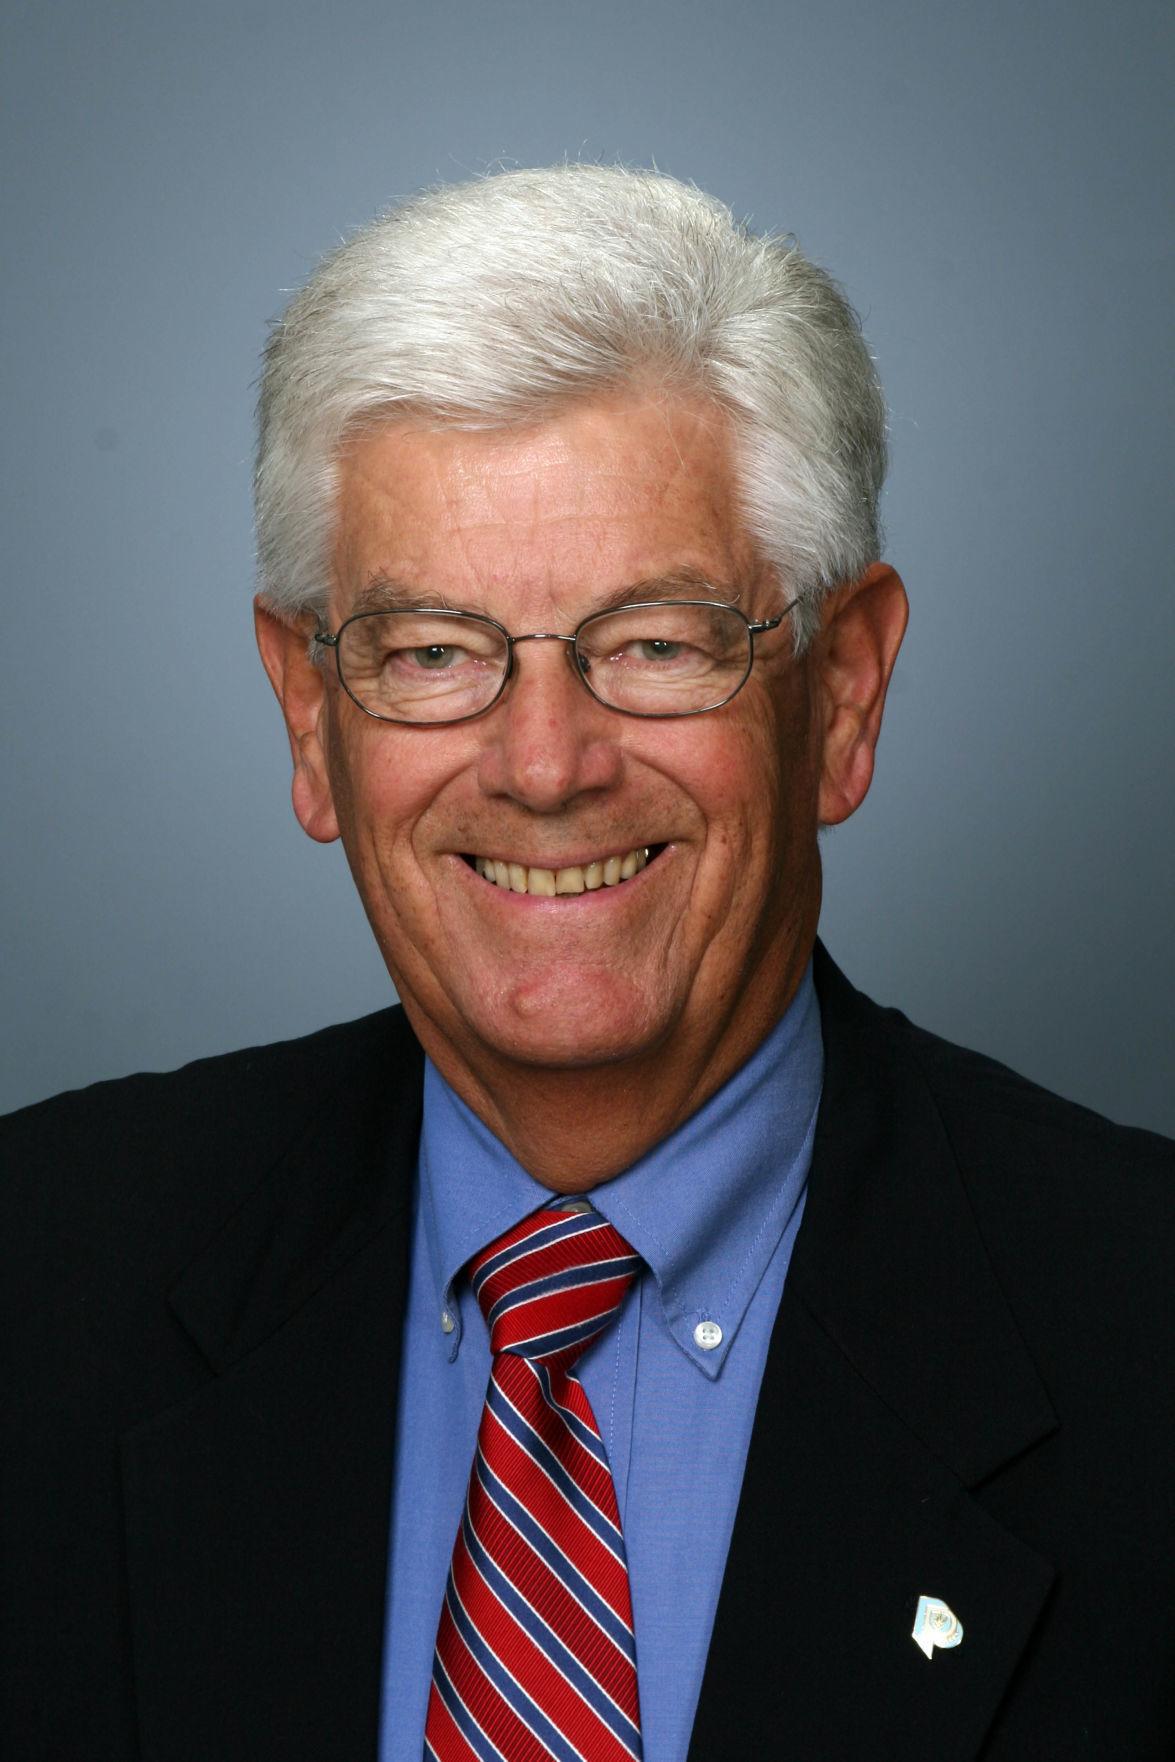 Plymouth City Council member Jim Willis